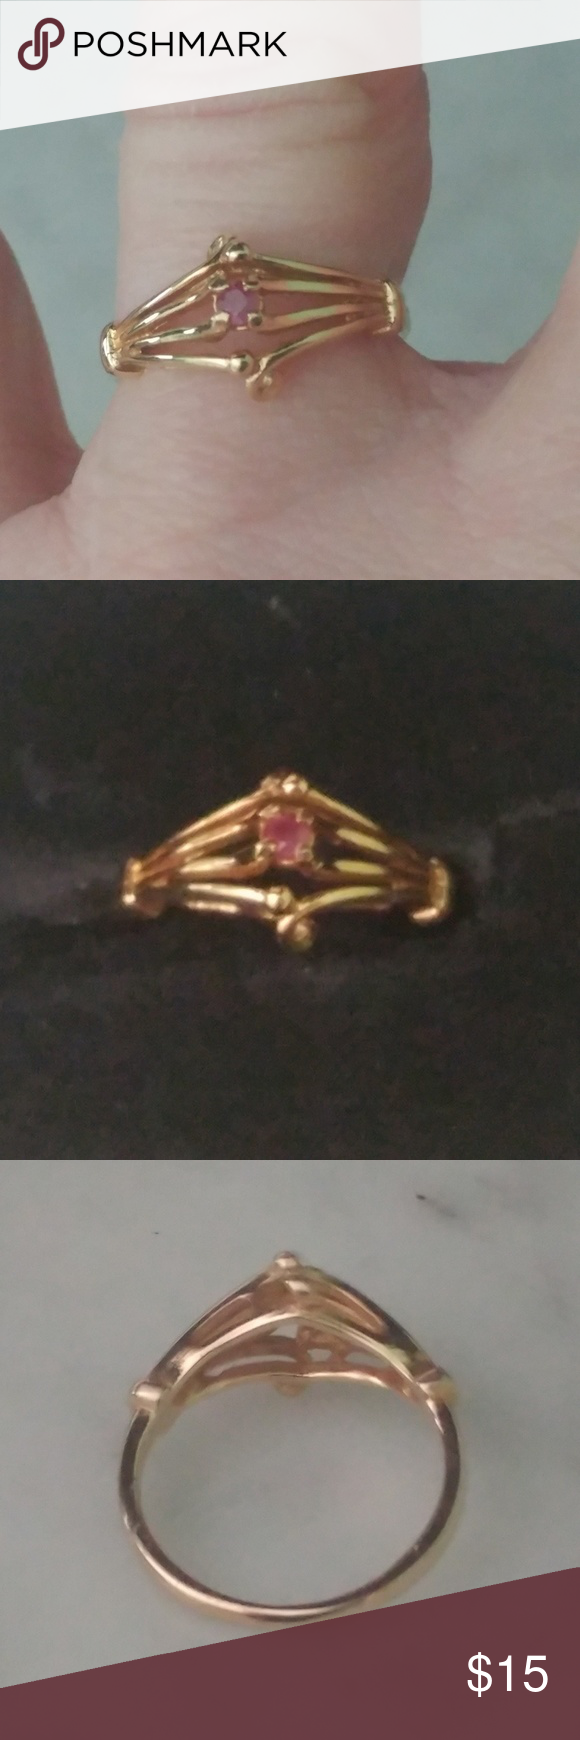 18k Hge Espo Pink Gem Ring Size 7 18k Hge Espo Pink Gem Ring Size 7 Designed By Joseph Esposito Marked Euc Jewelry Rings Pink Gem Ring Gem Ring Pink Gem